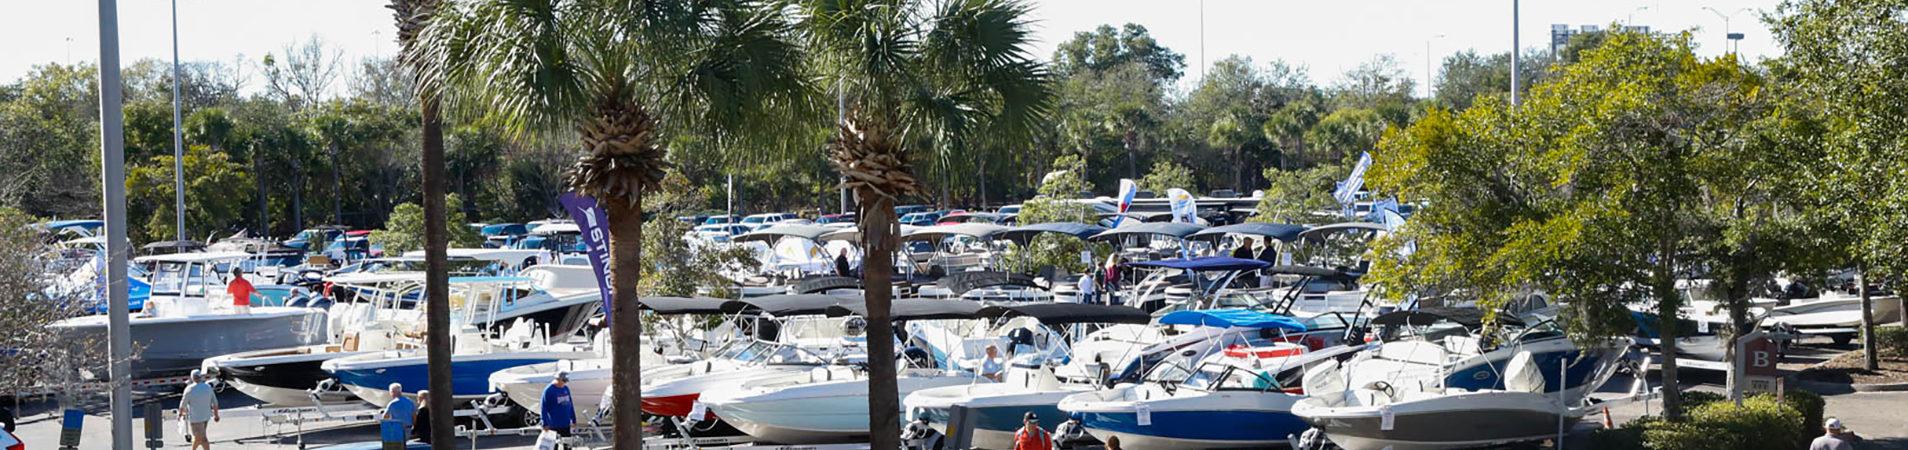 Prime Osborn Boat Show 2020